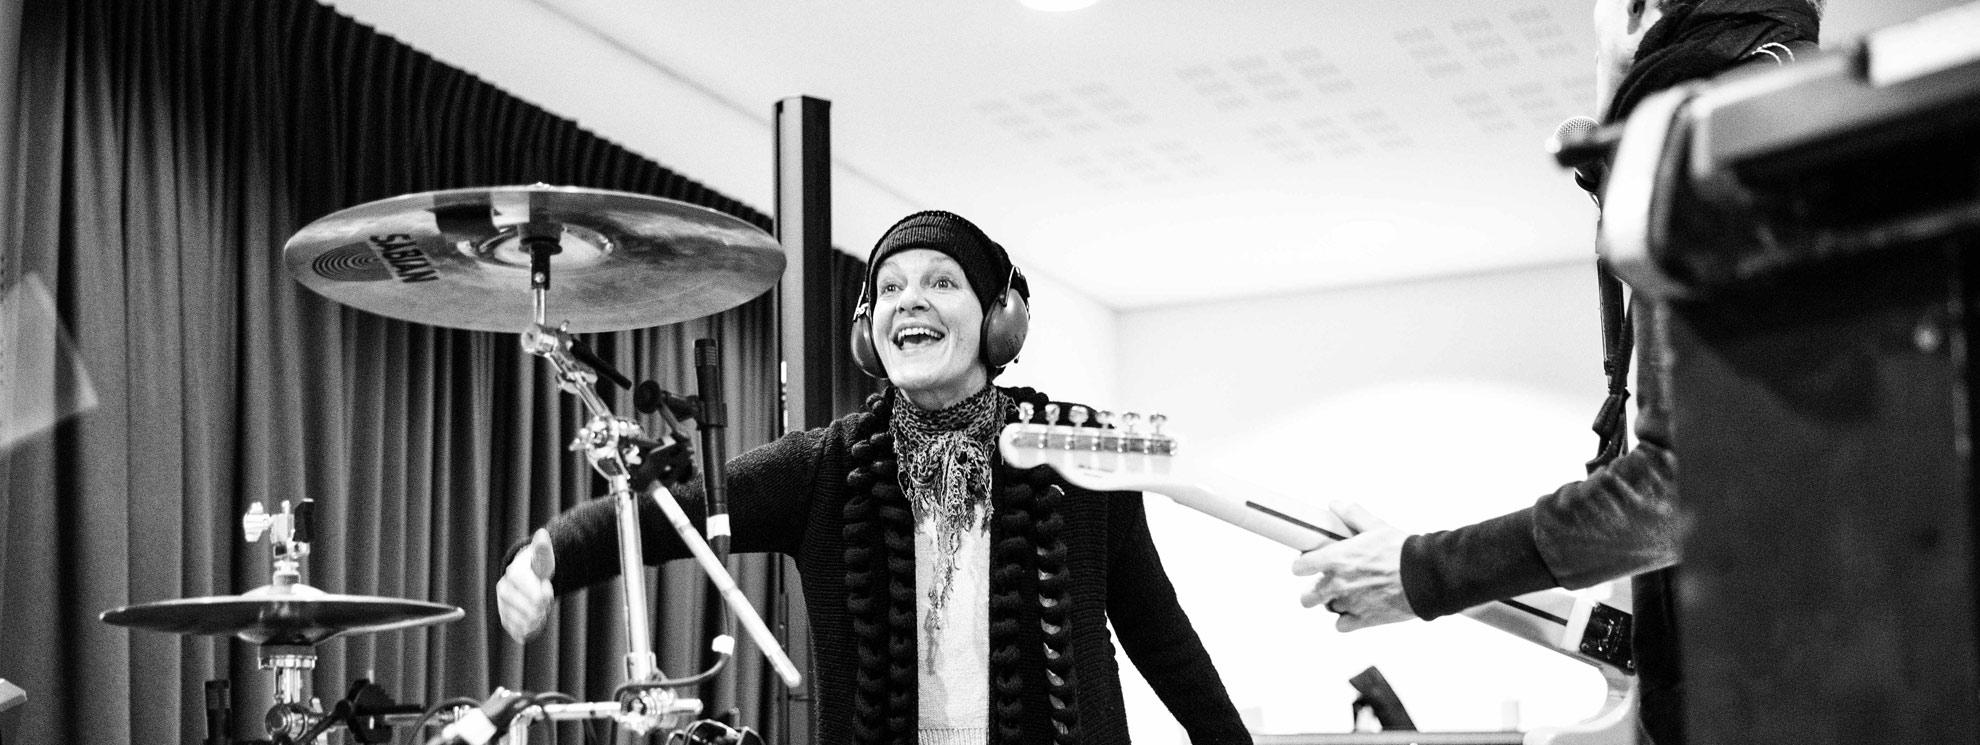 Bettina Habekost - Performance